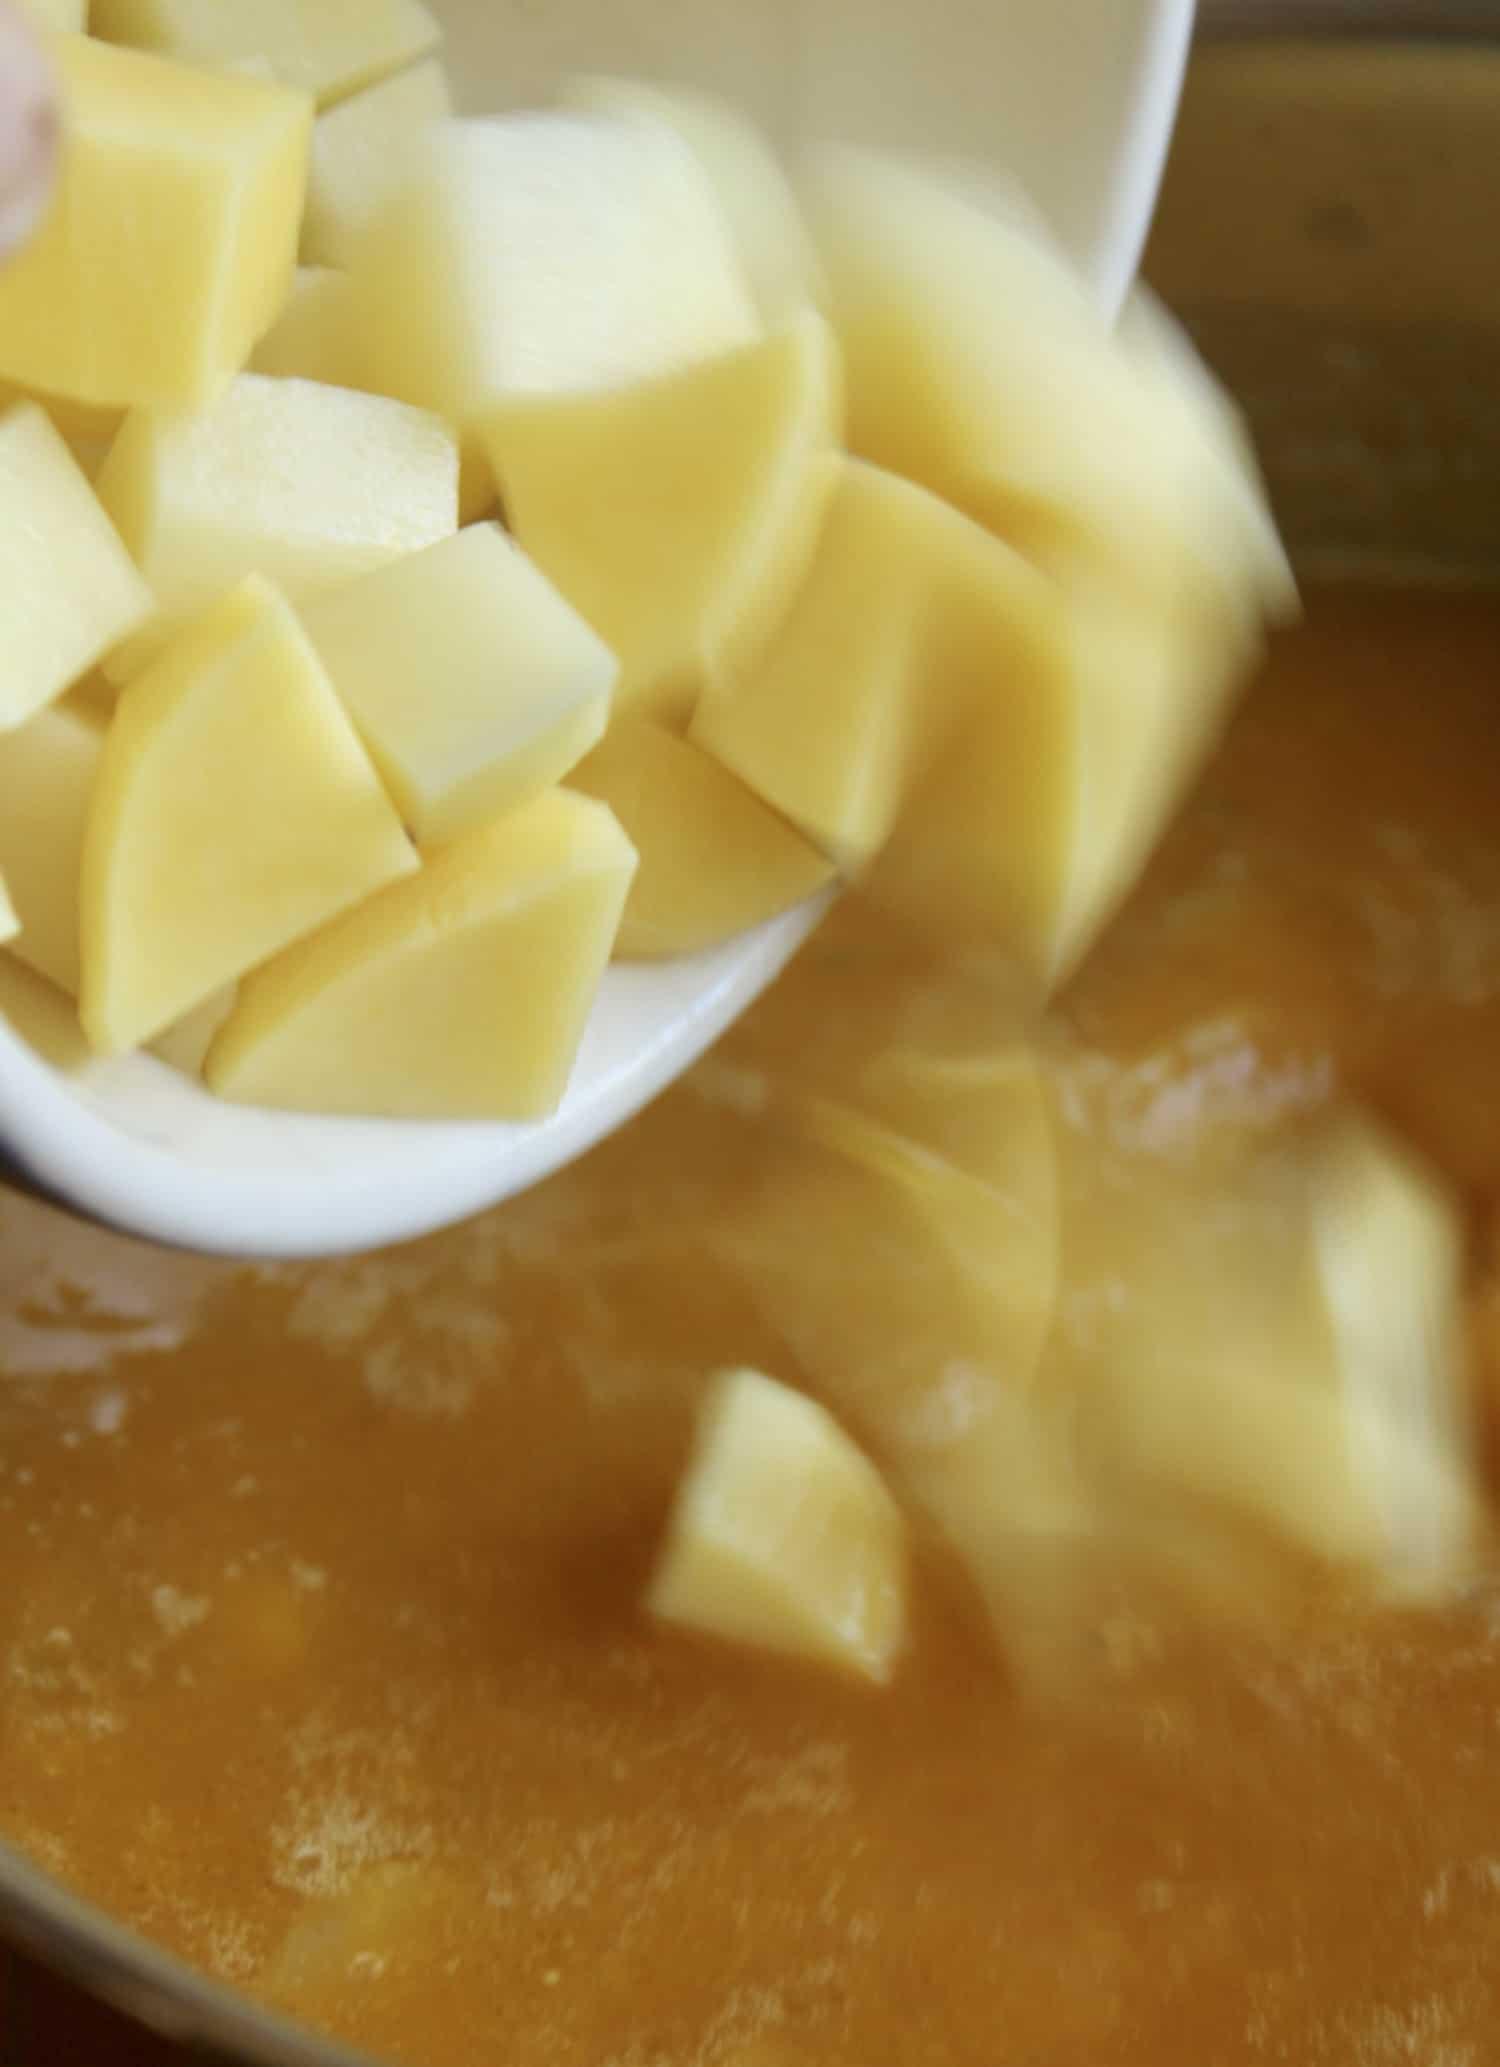 adding chunks of potatoes